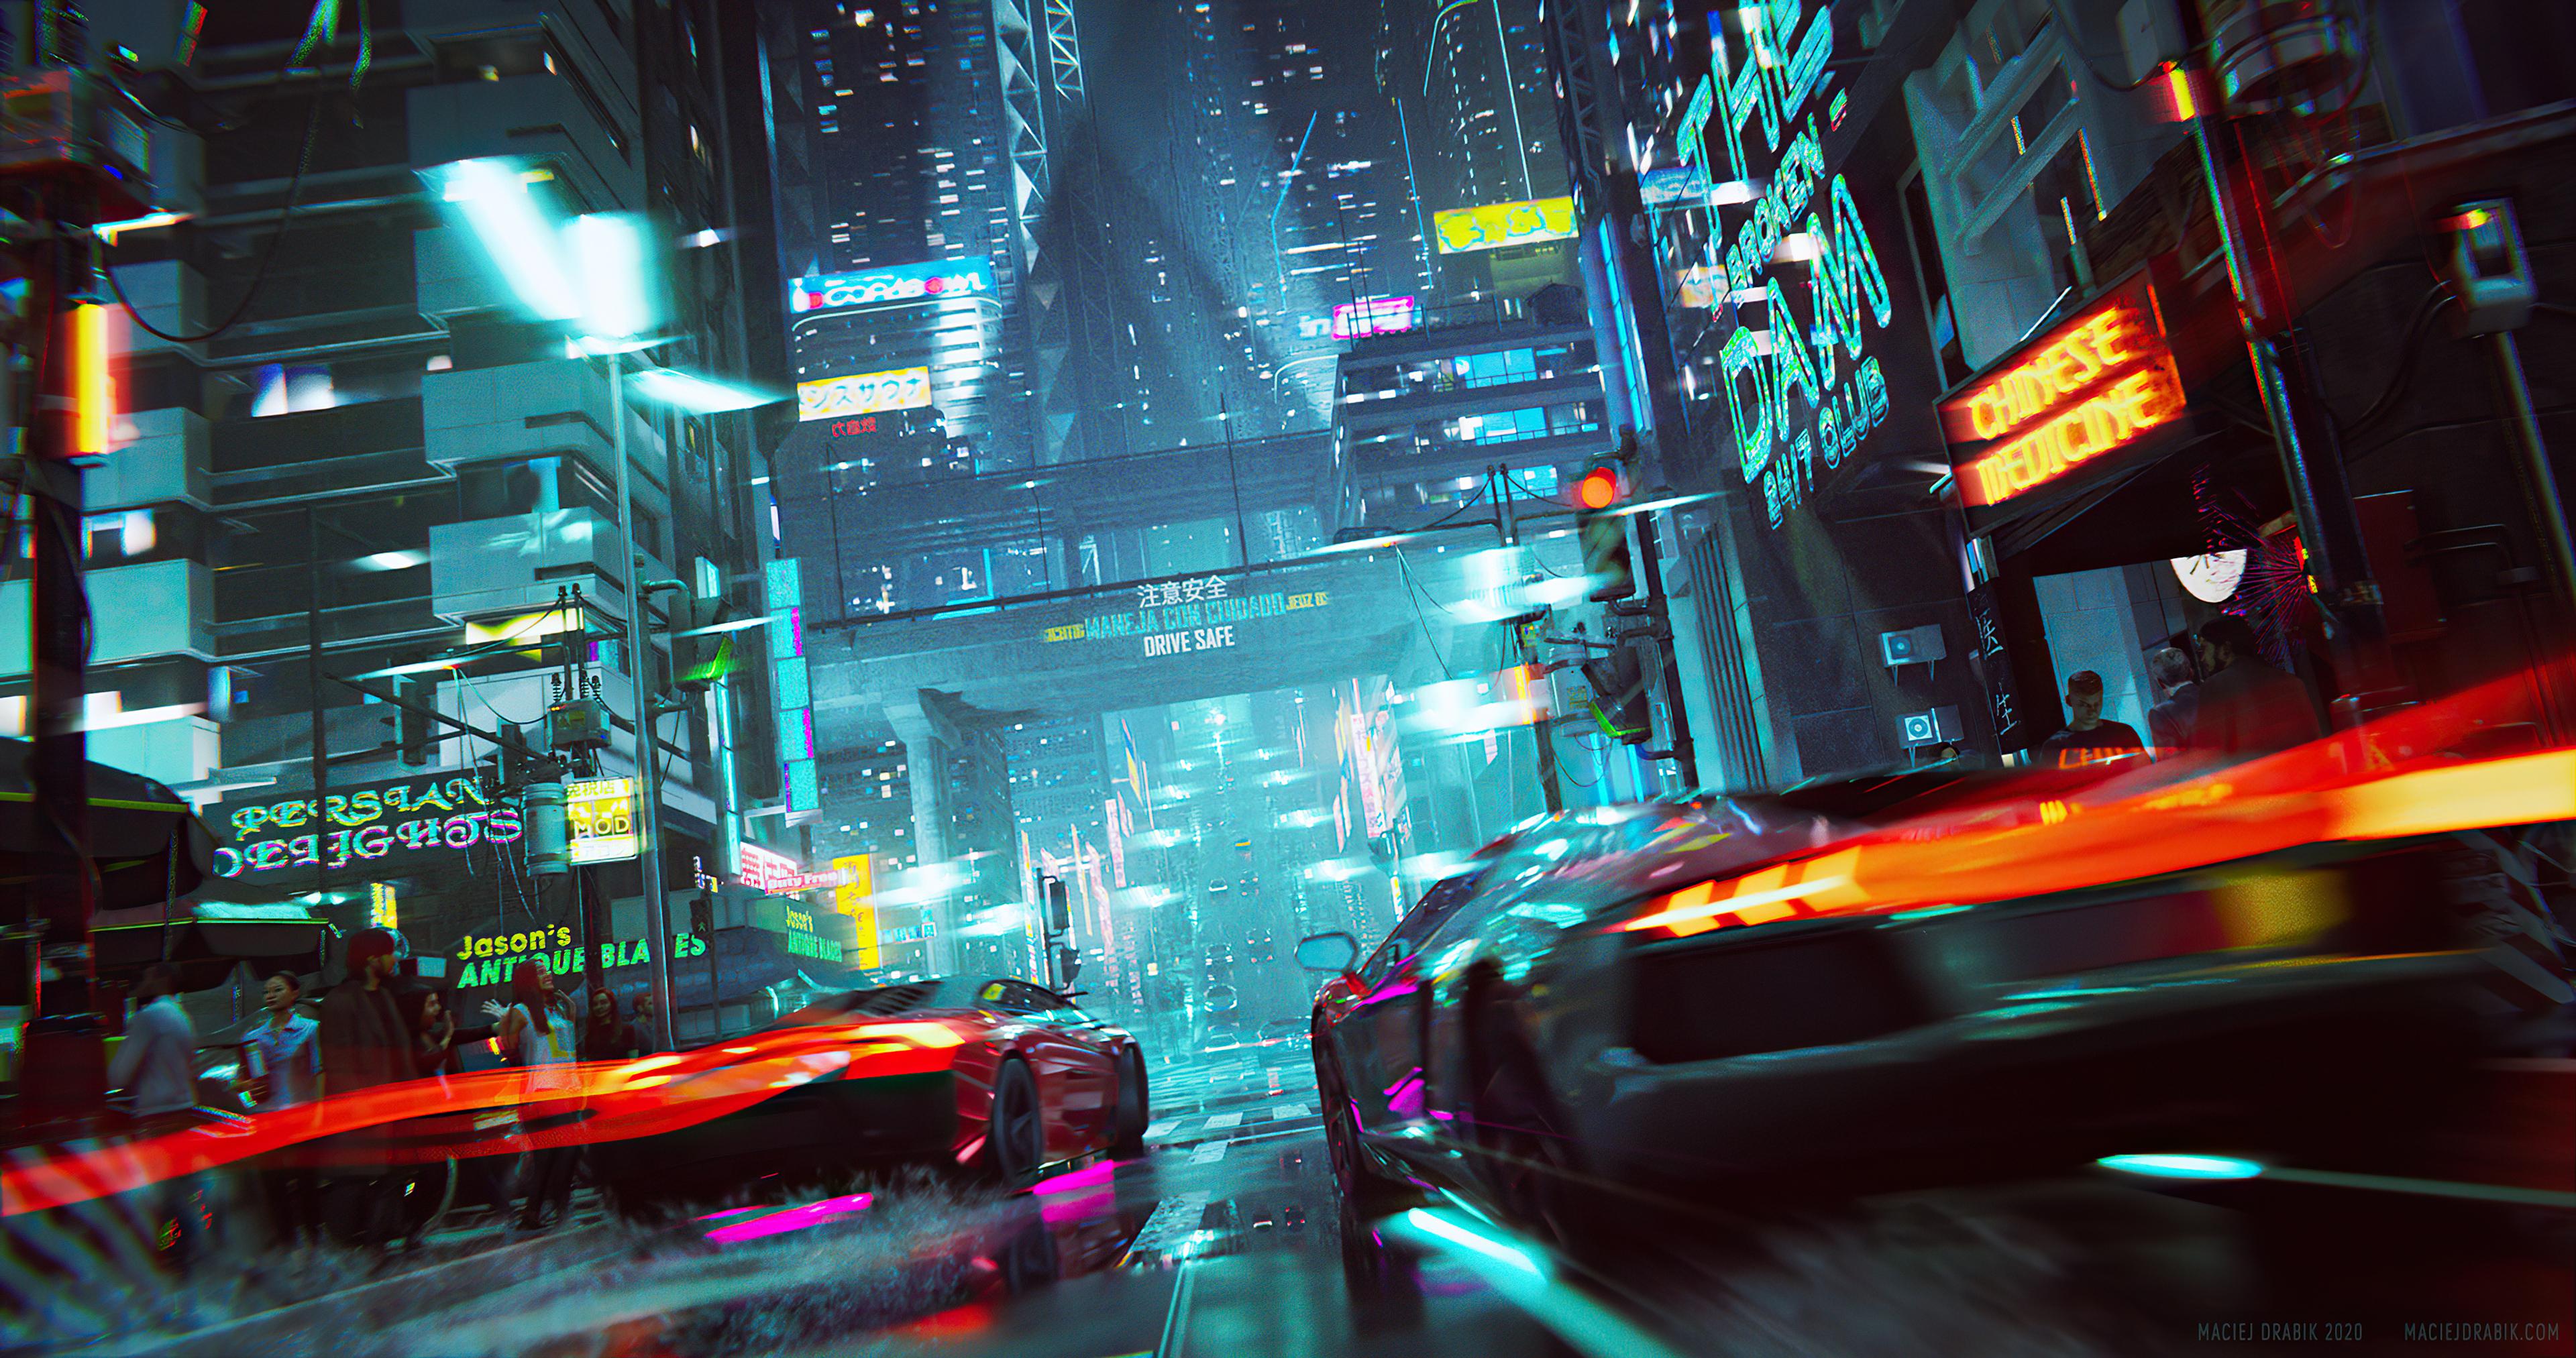 neon cyberpunk city car racing 4k 1608622924 - Neon Cyberpunk City Car Racing 4k - Neon Cyberpunk City Car Racing 4k wallpapers